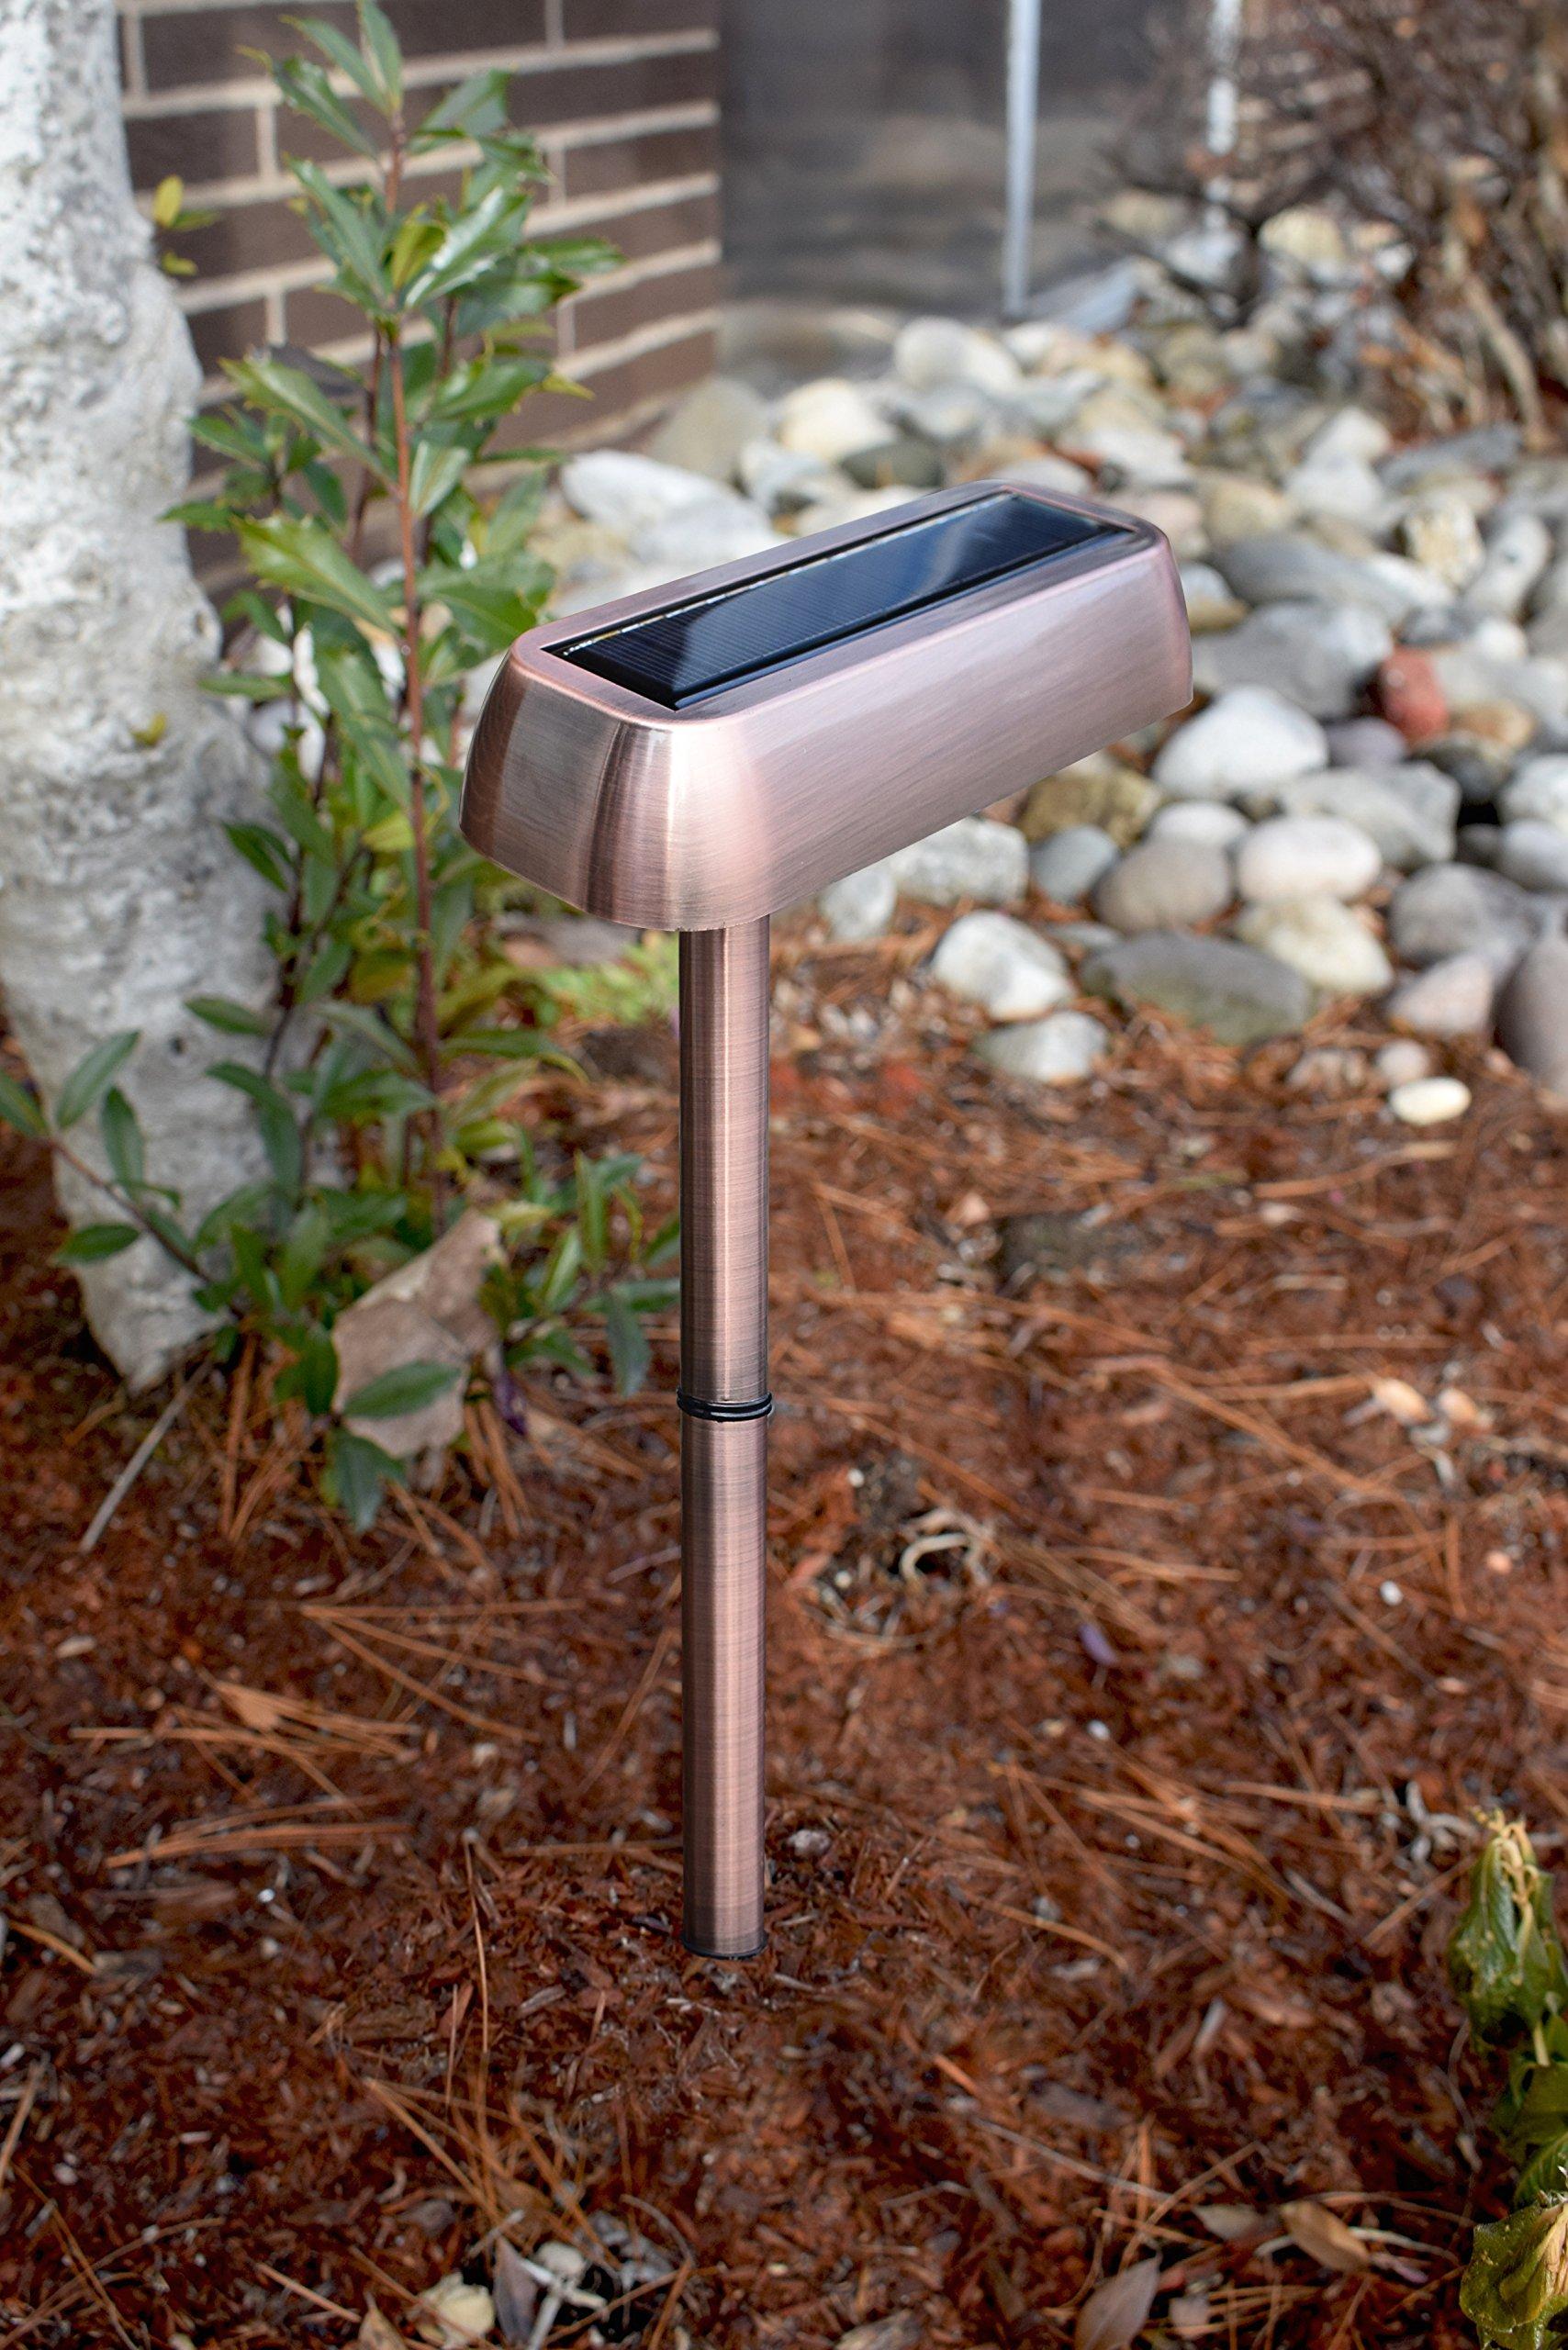 EcoThink - SOLAR POWERED Multipurpose Light - 3 usage types; Gutter, Stake and Mount,110 Lumen Light output